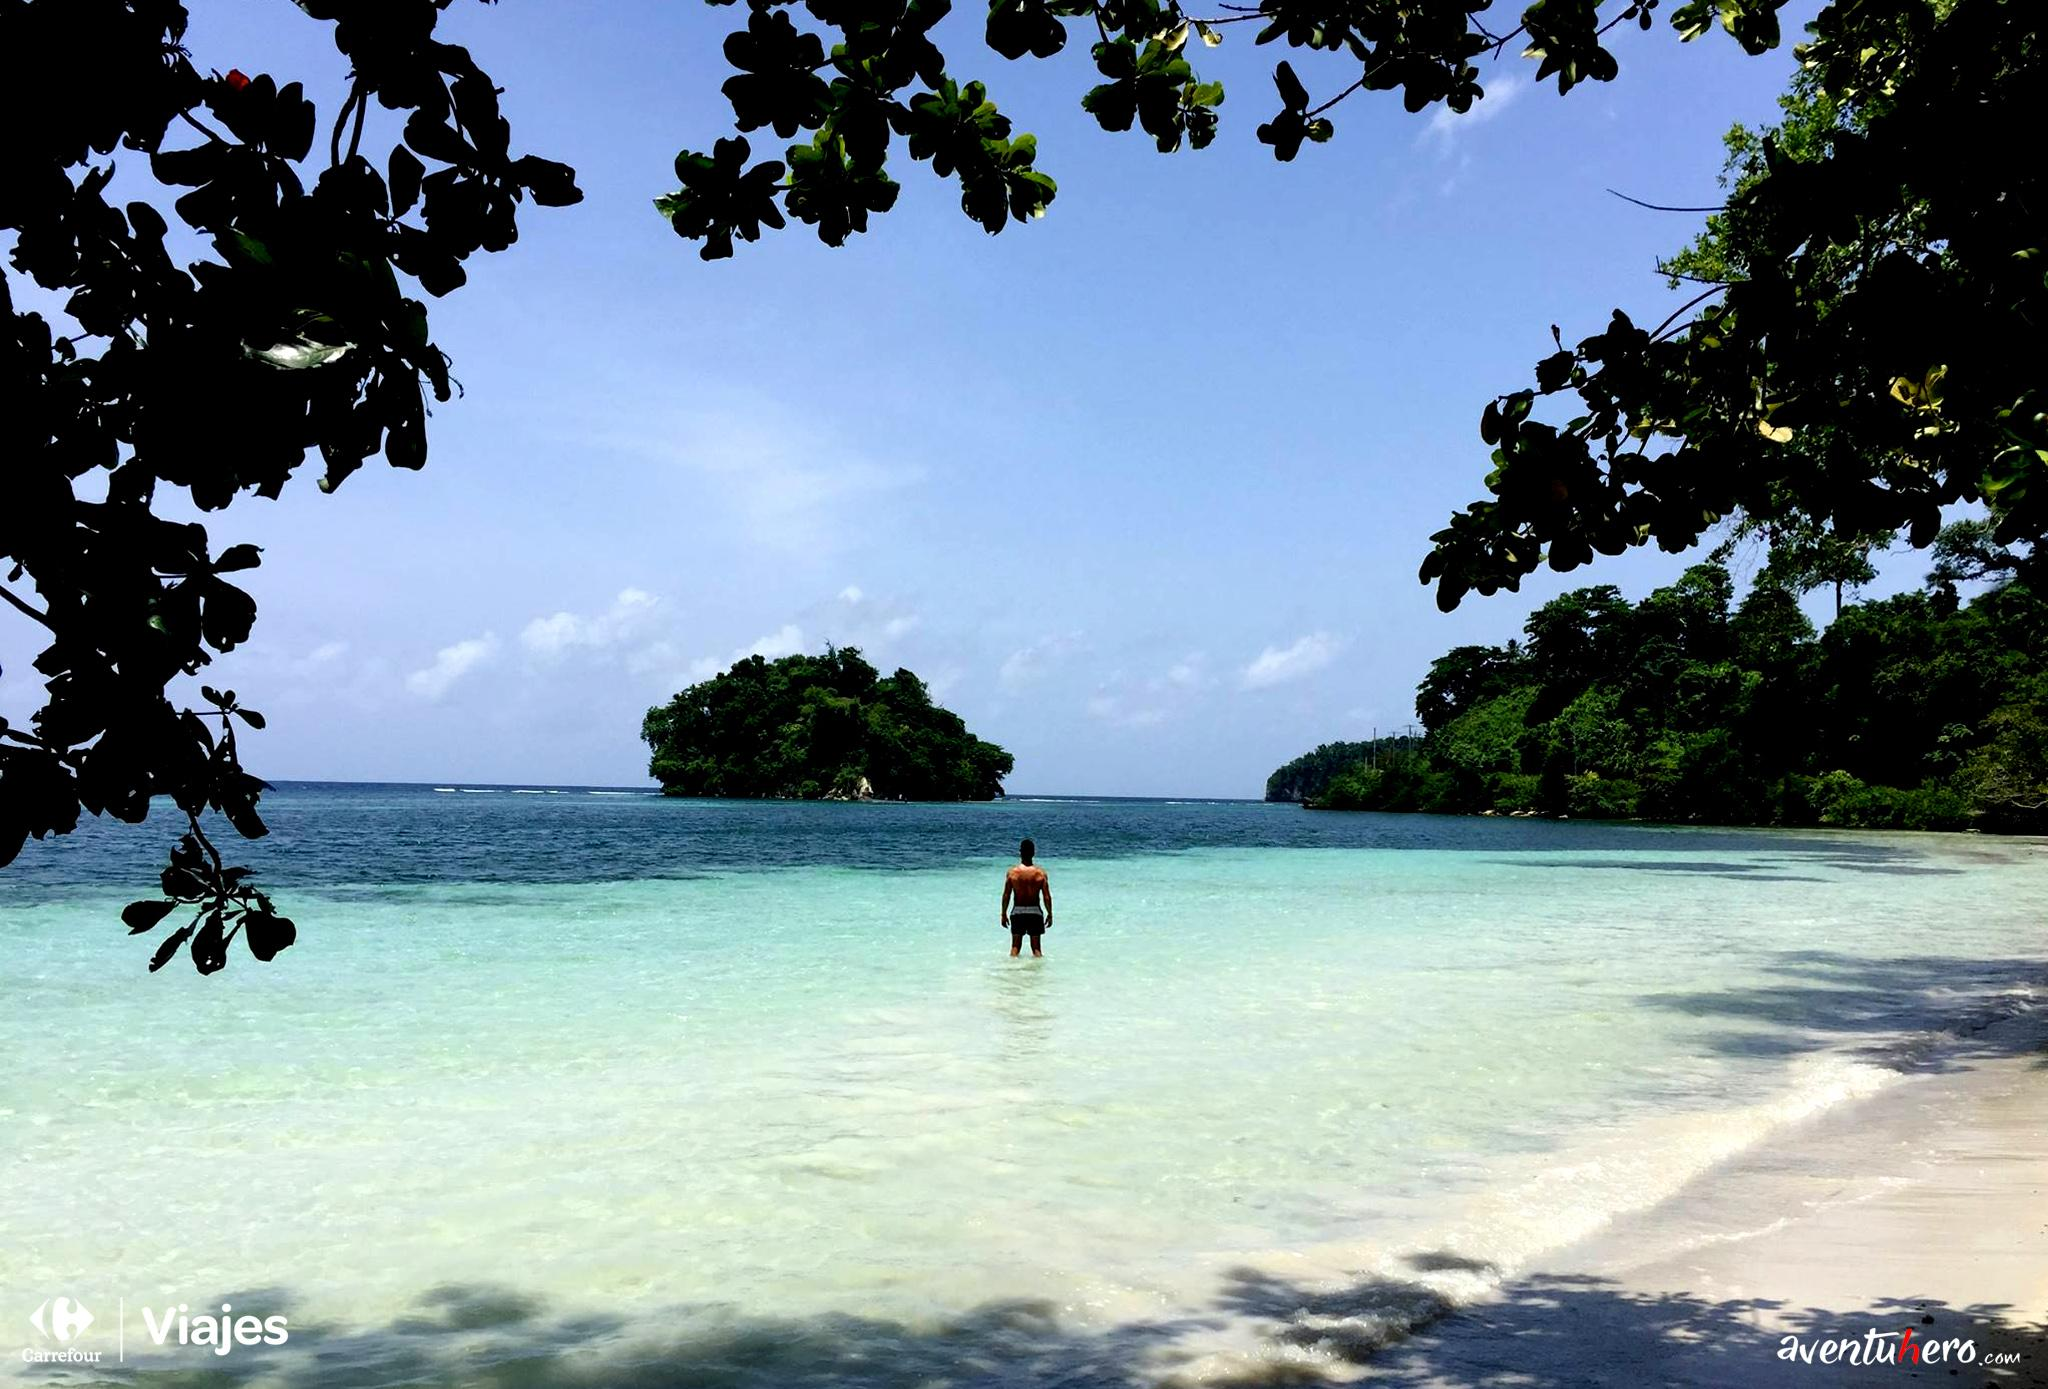 Aventuhero - San San Beach. Jamaica